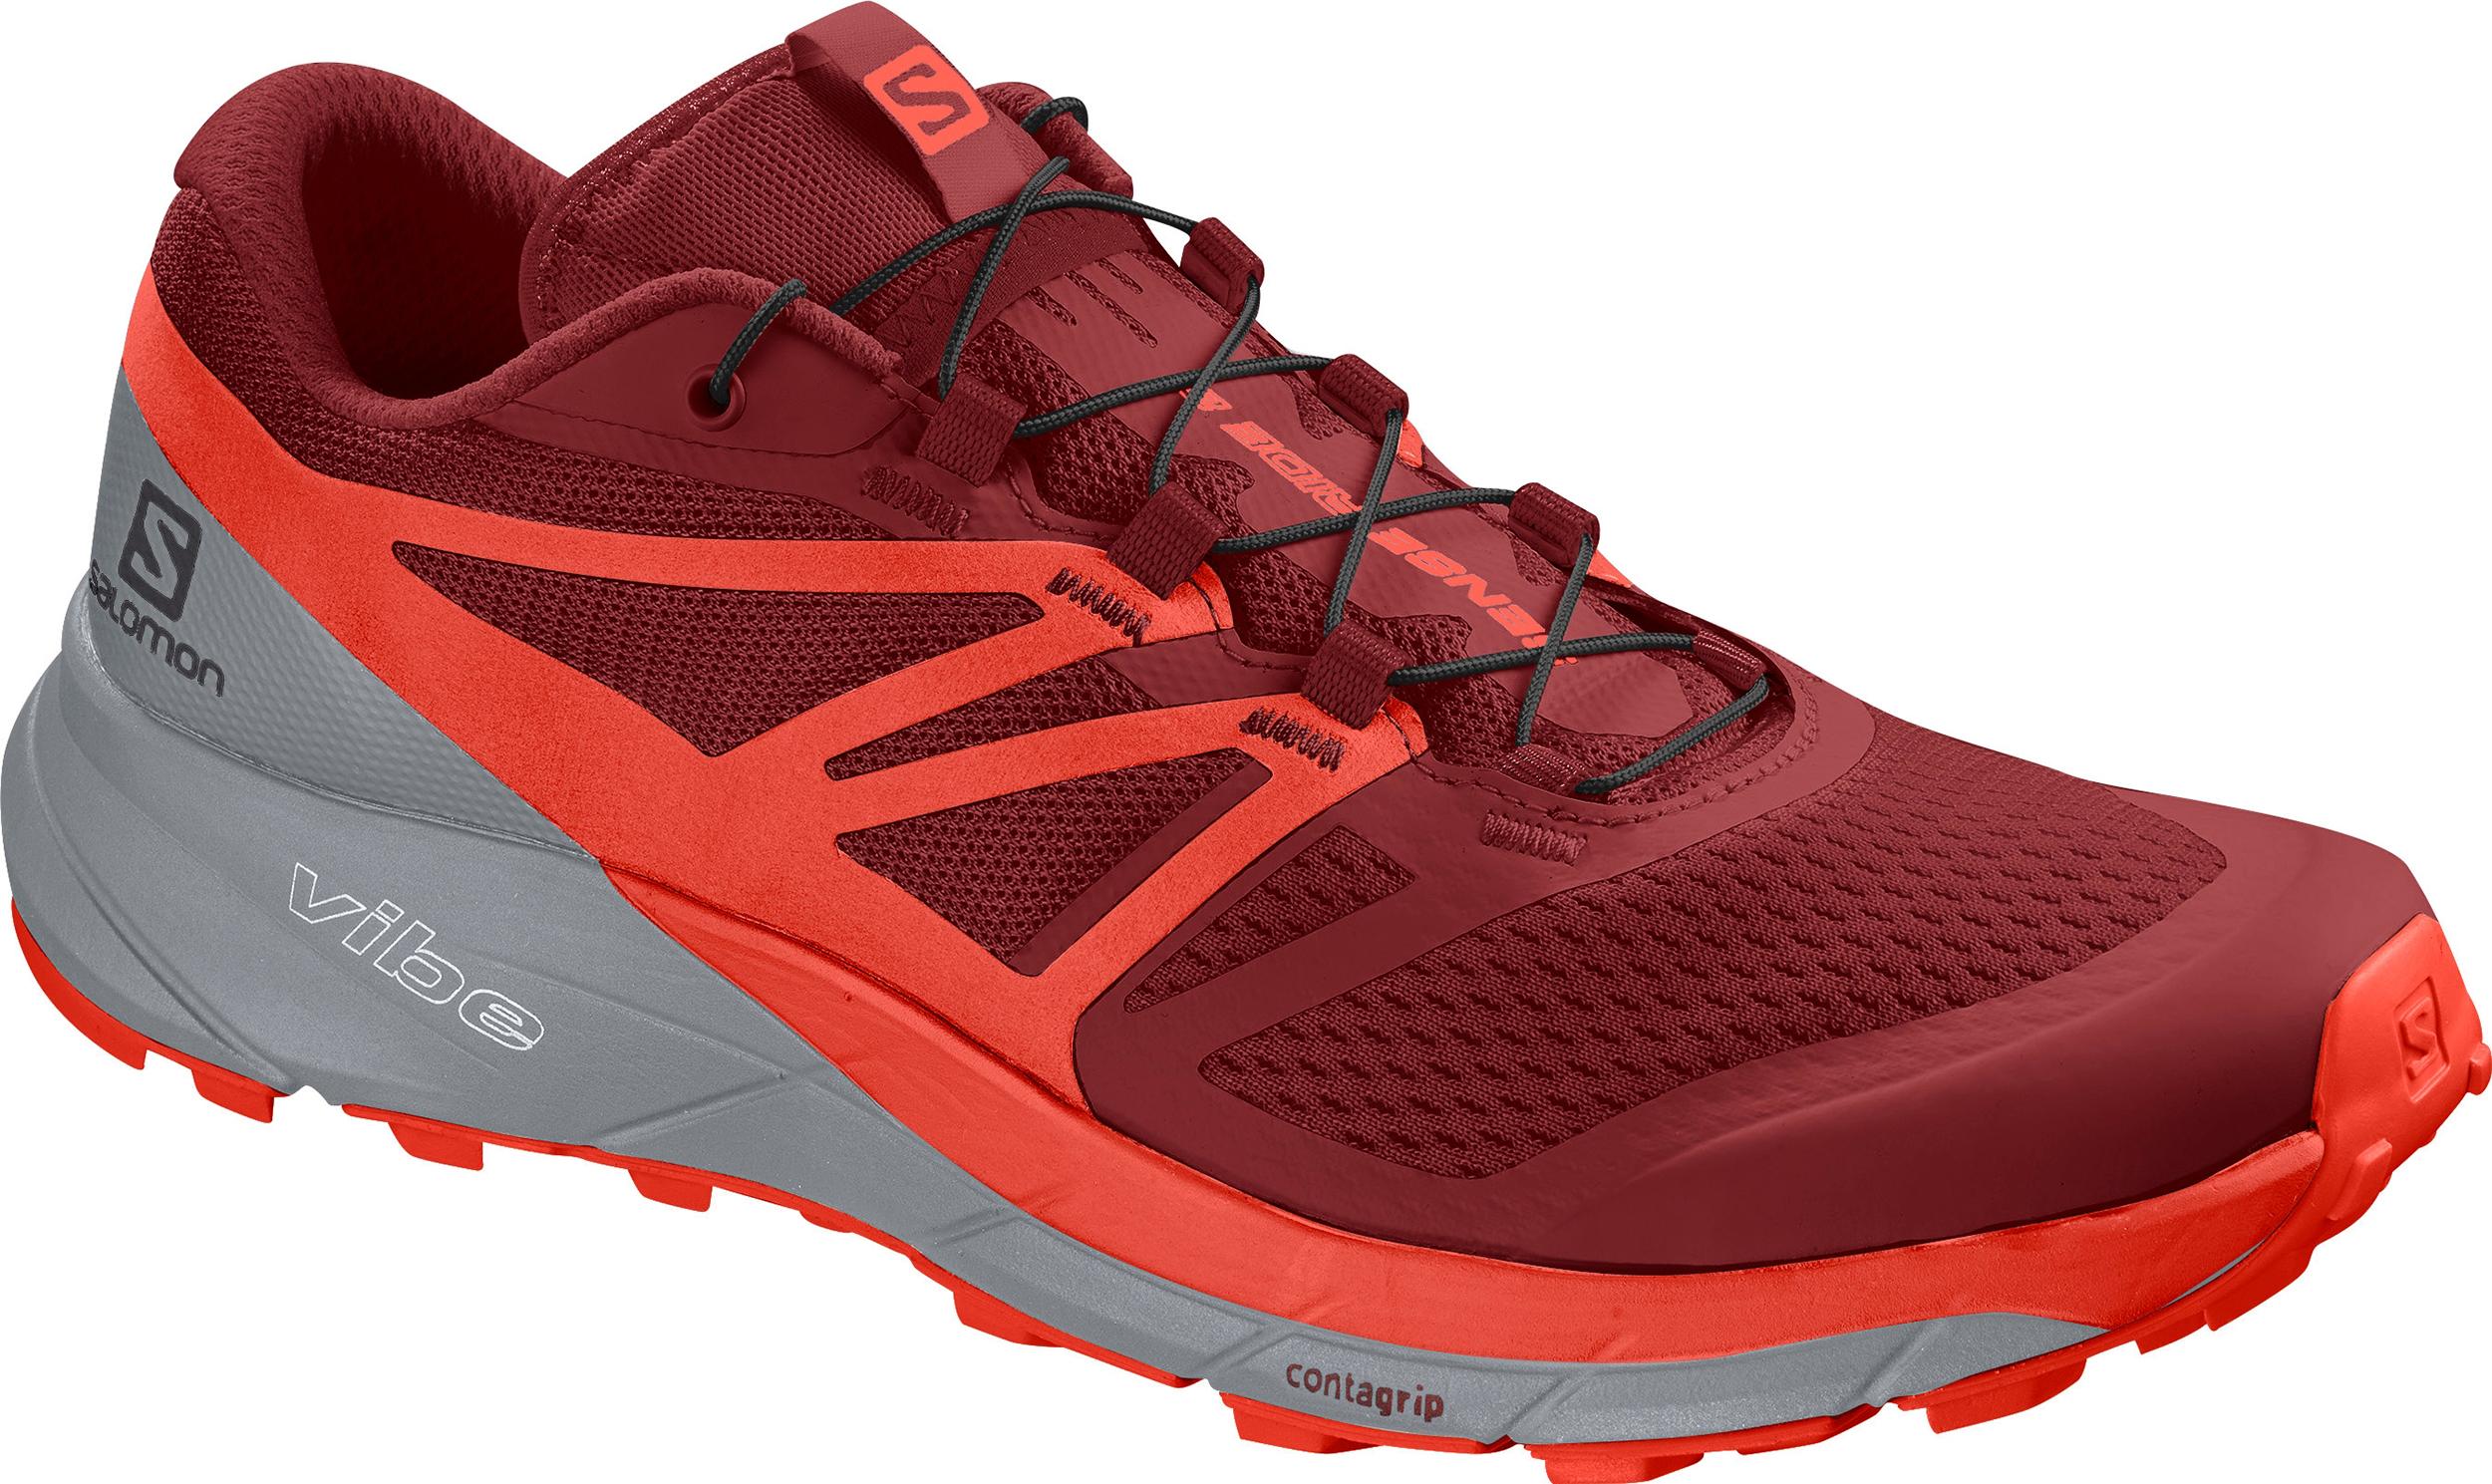 premium selection 24091 08cdc Salomon Sense Ride 2 Trail Running Shoes - Men's